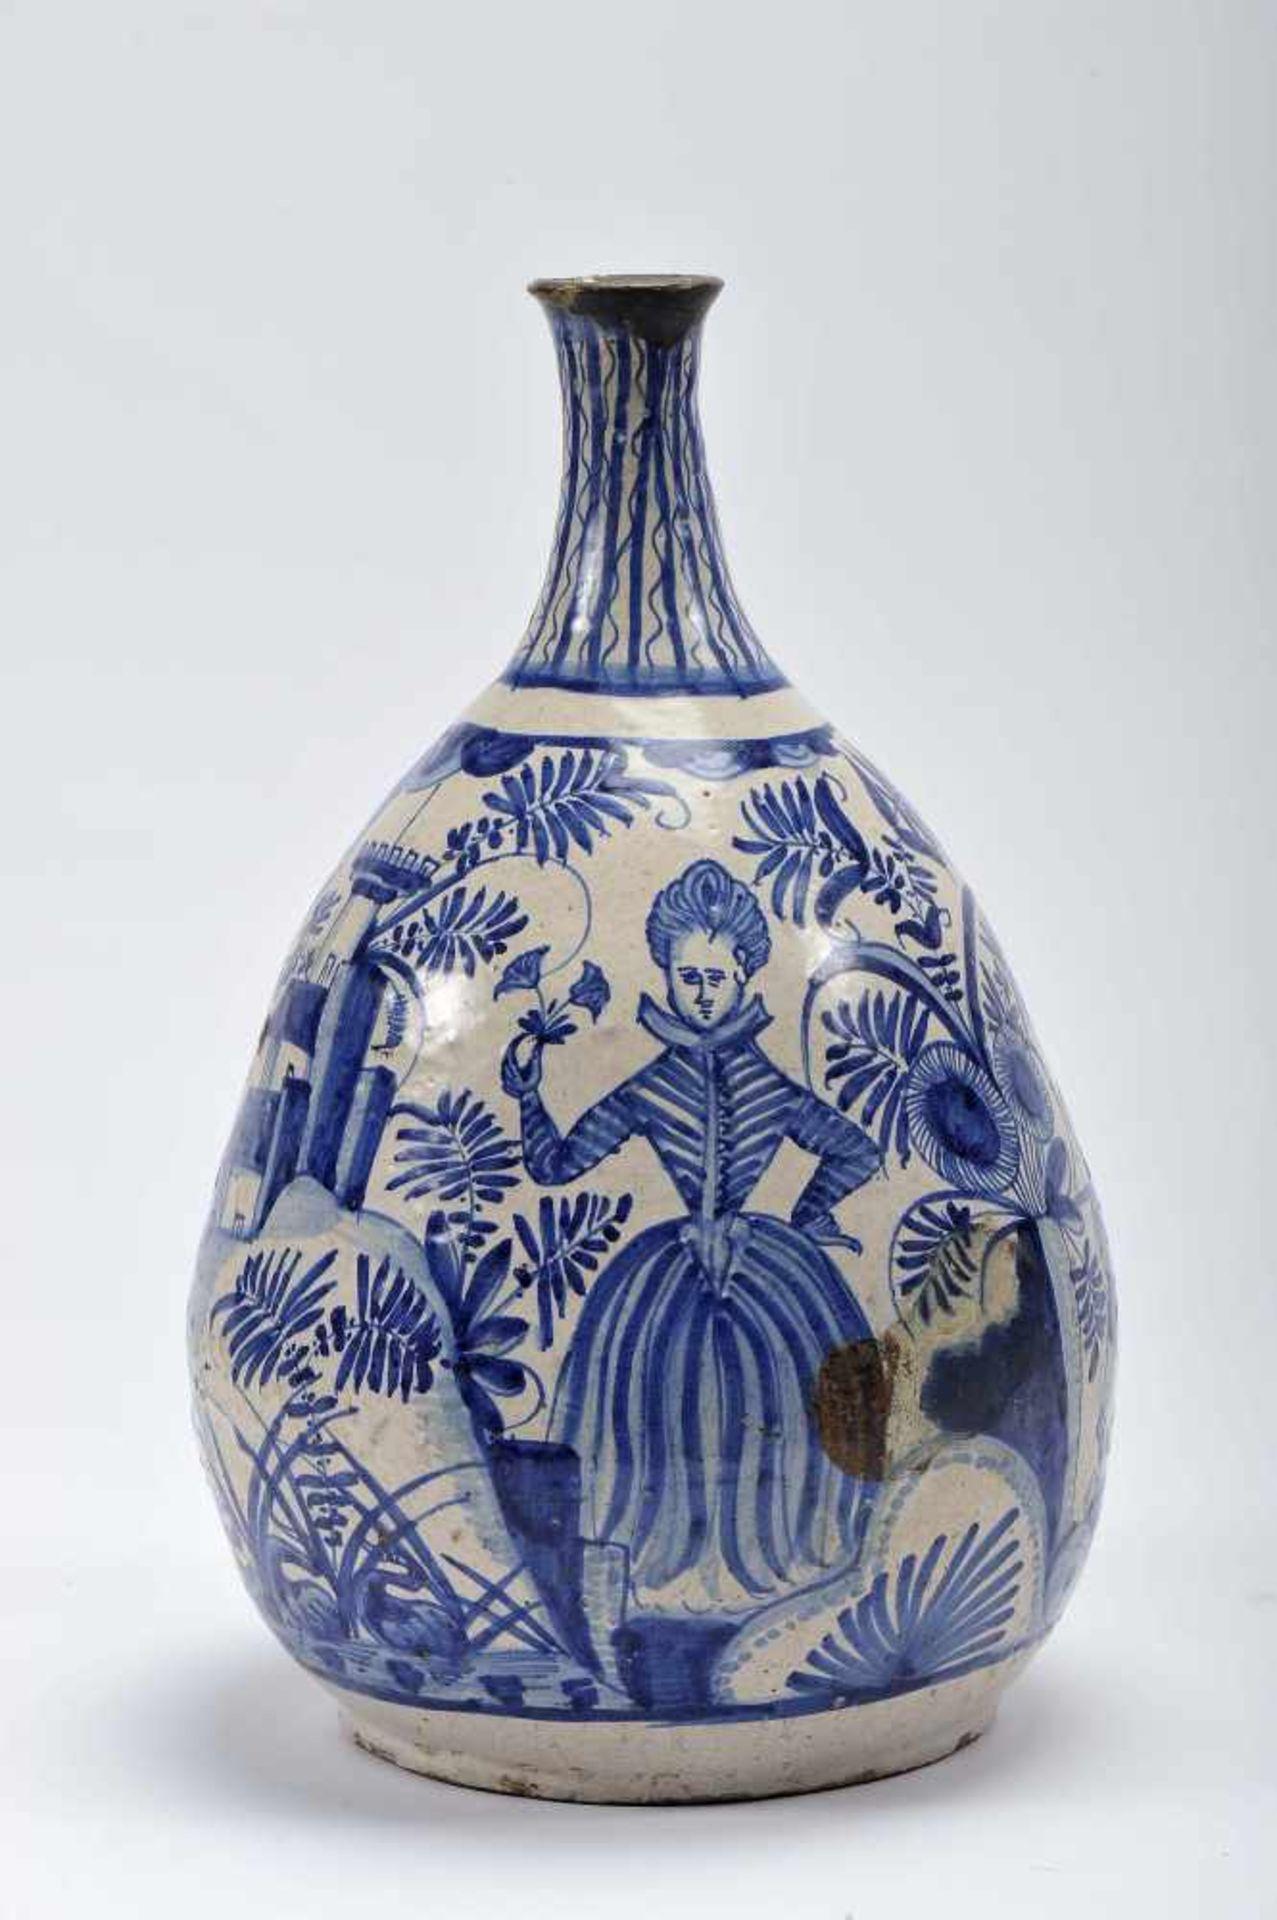 "Los 52 - A Pear shaped BottleA Pear shaped Bottle, faience, blue decoration ""Landscape with female figure..."